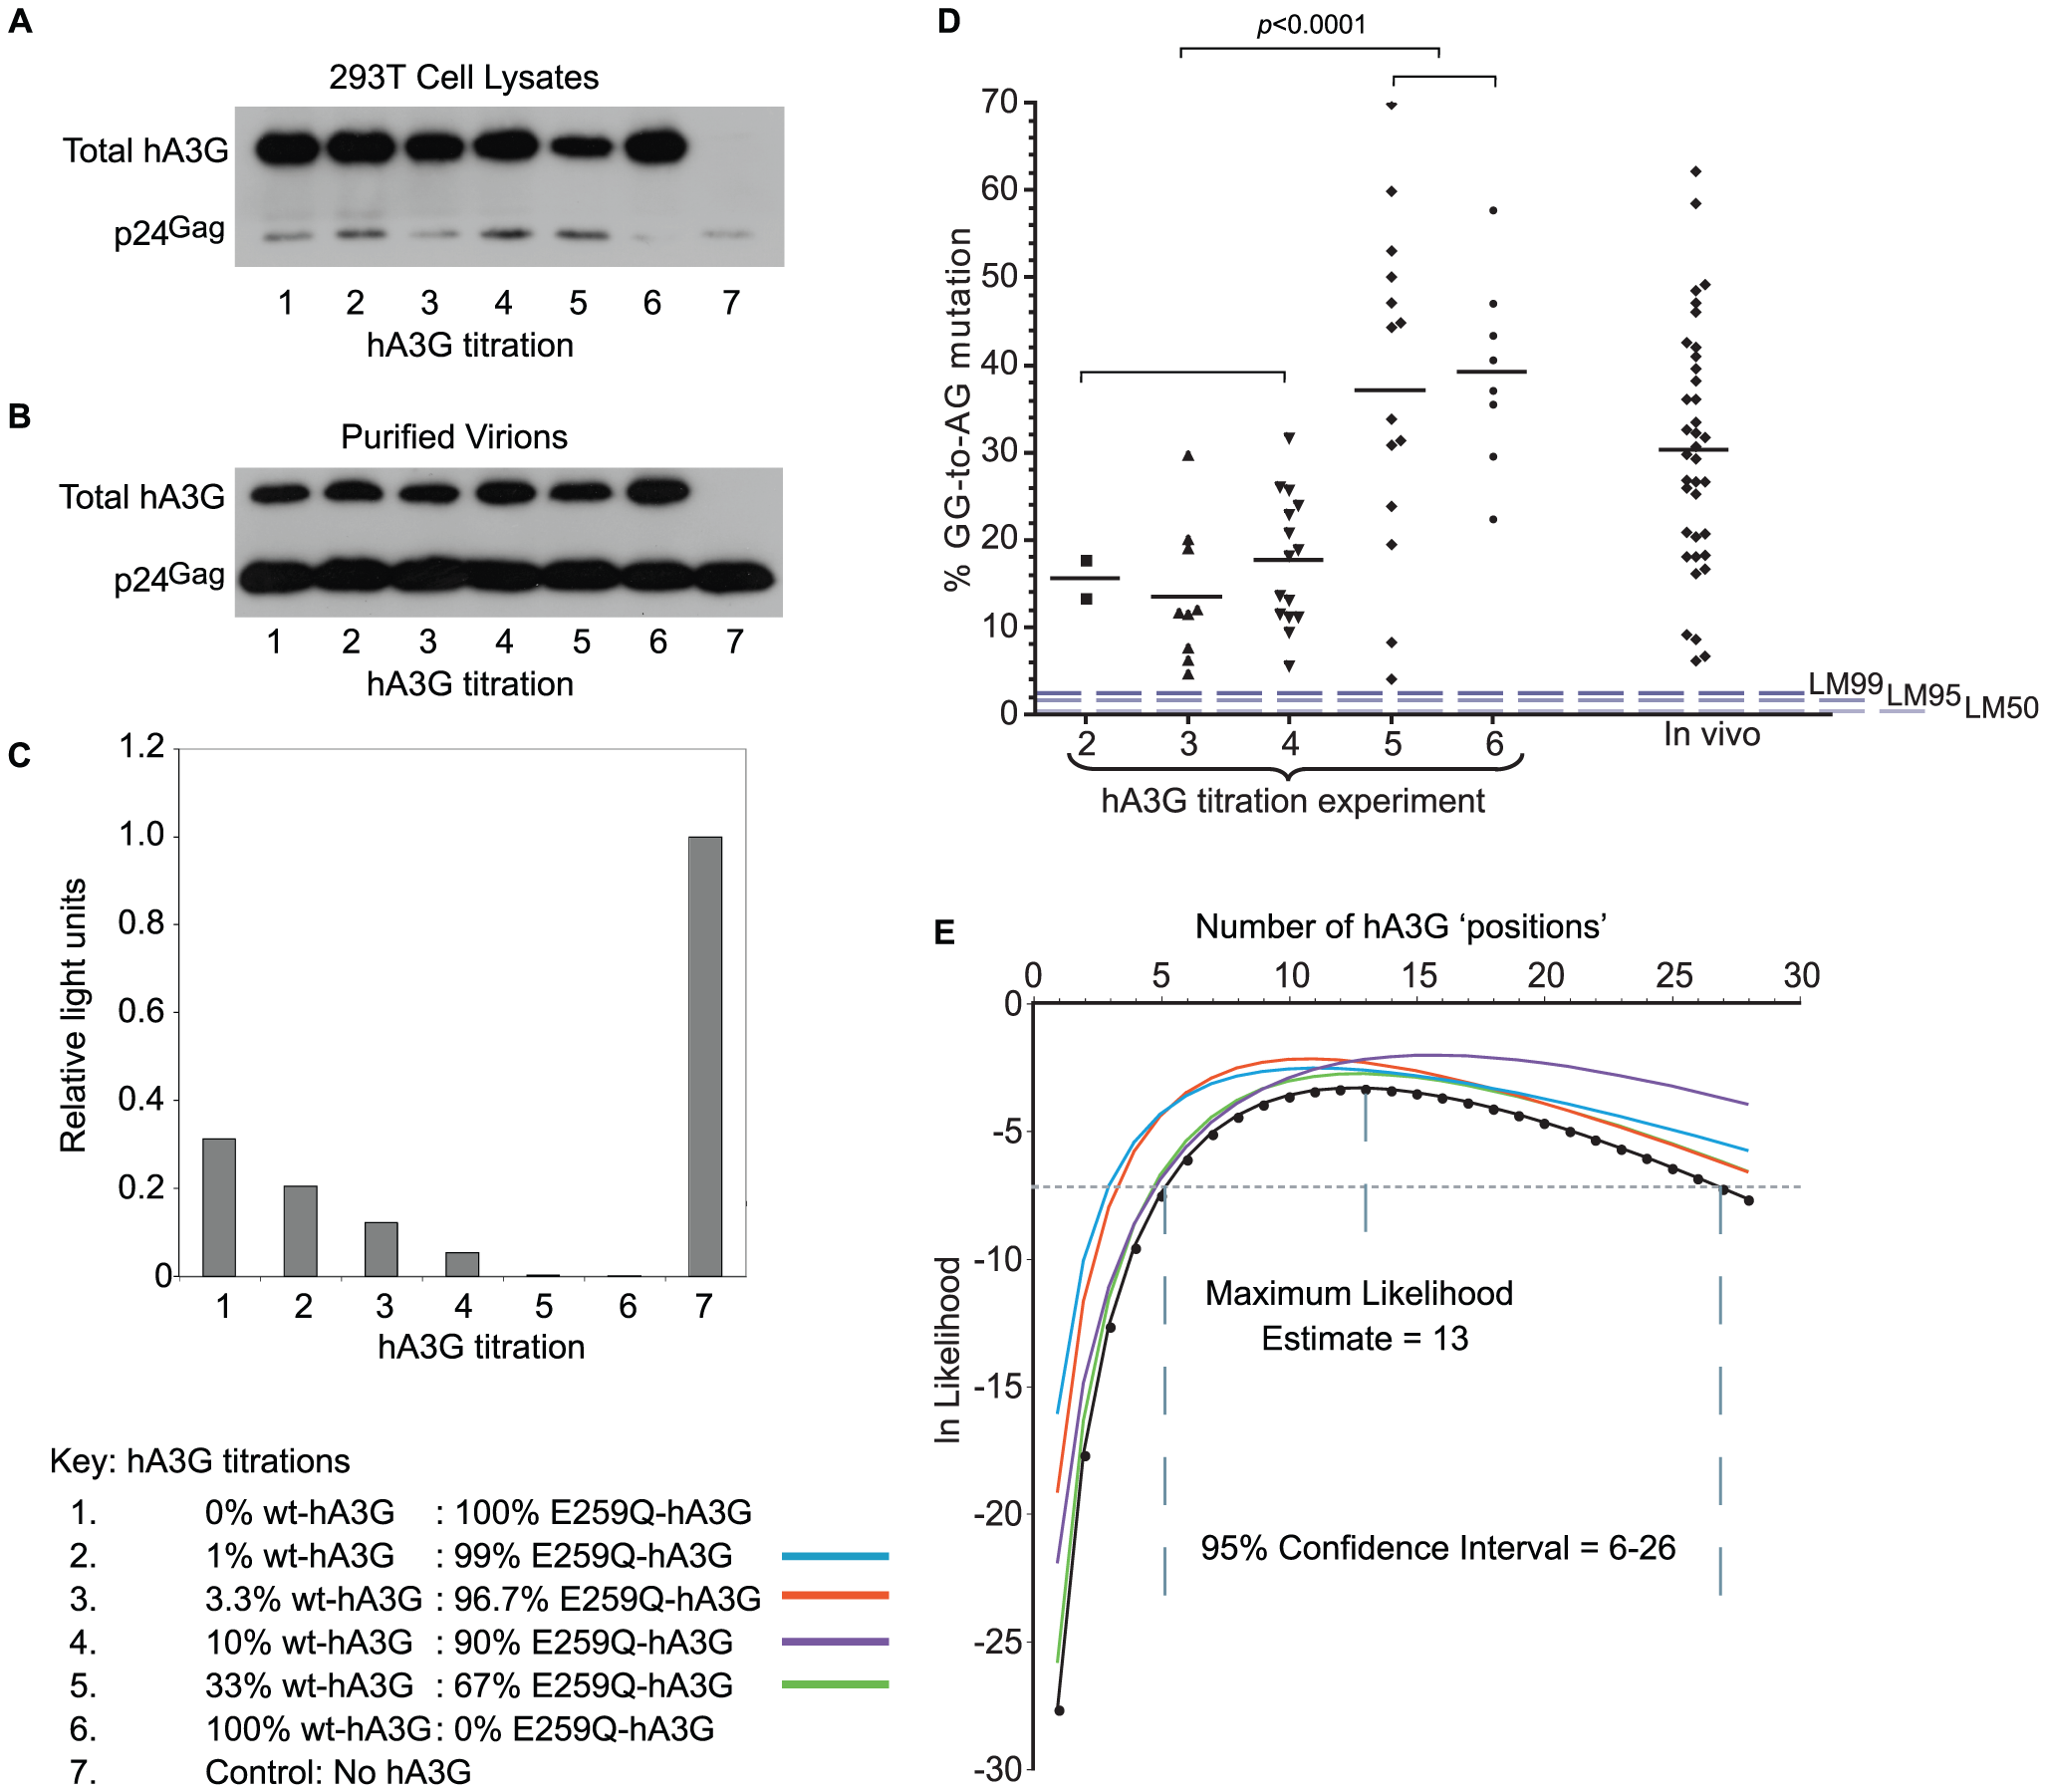 hA3G-induced mutation frequency <i>in vitro</i> and <i>in vivo</i>.